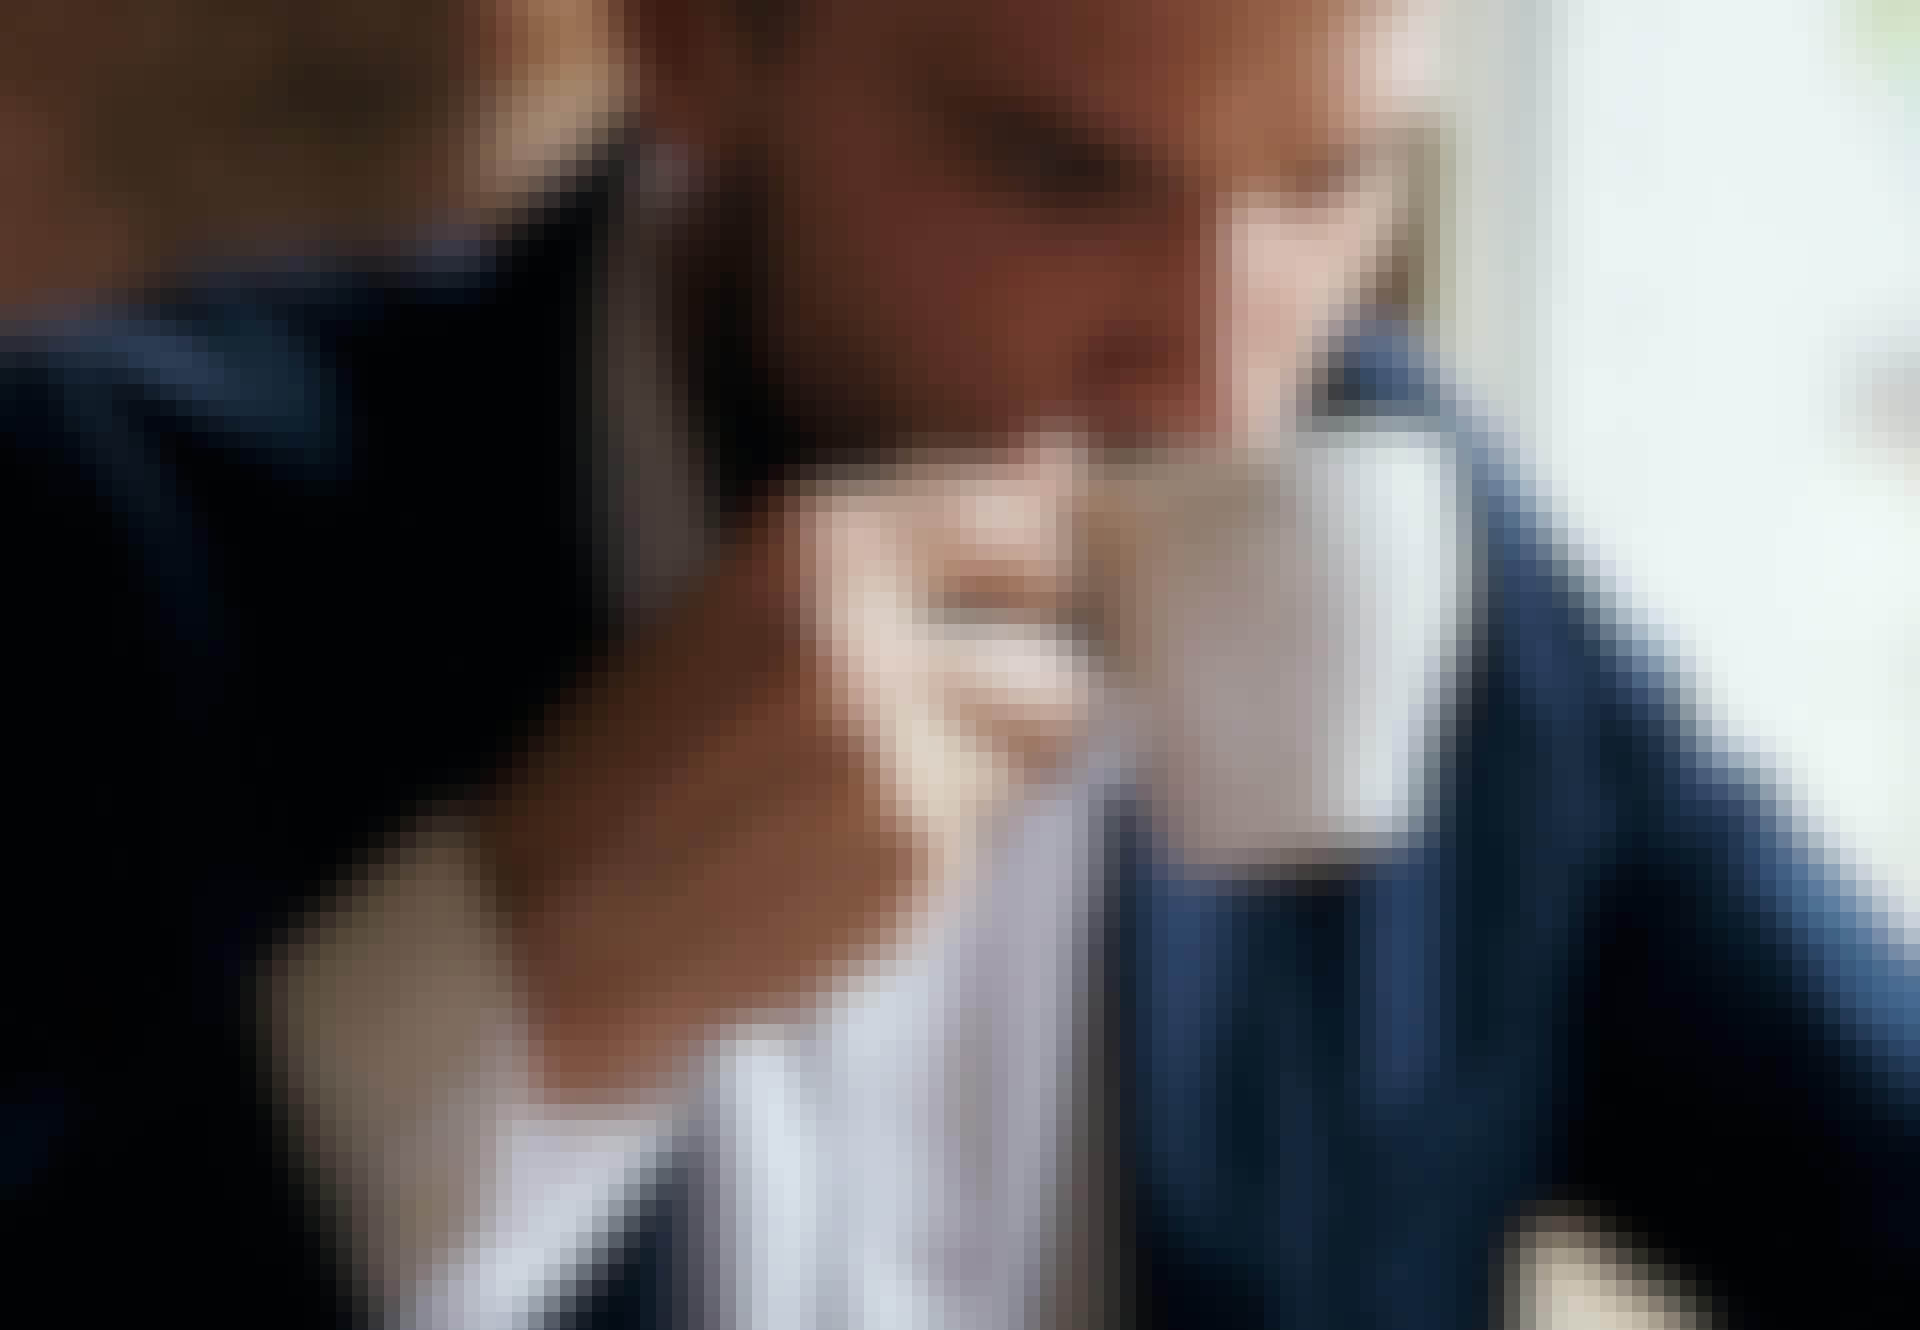 en mand drikker kaffe